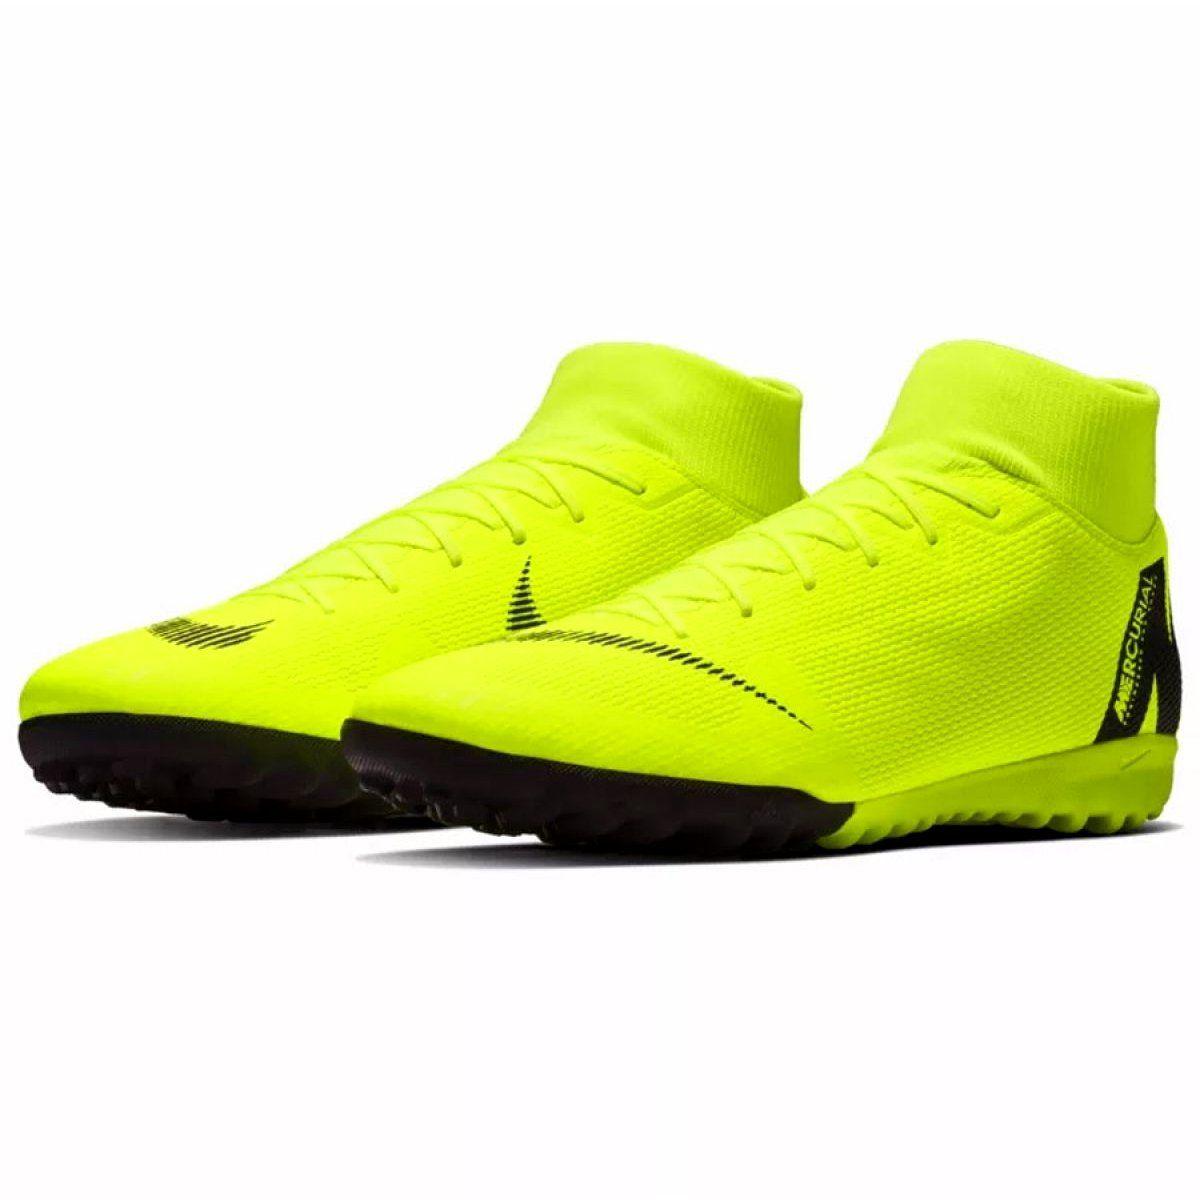 Buty Pilkarskie Nike Mercurial Superflyx 6 Academy Tf M Ah7370 701 Zolte Wielokolorowe Astro Turf Trainers Football Boots Astro Football Boots